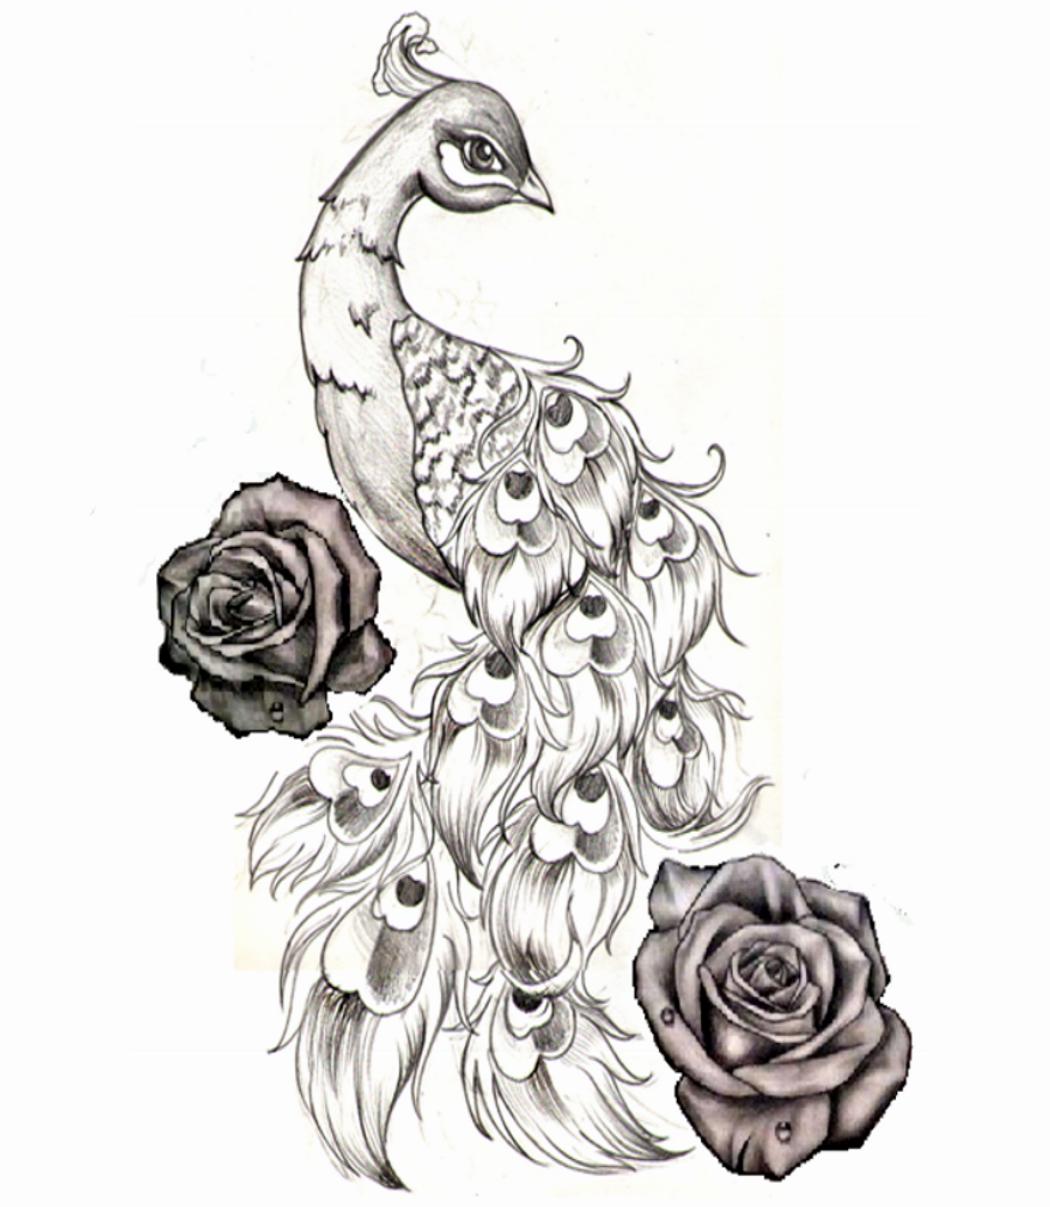 Cadeau Tata 21 août Half sleeve tattoos designs, Peacock